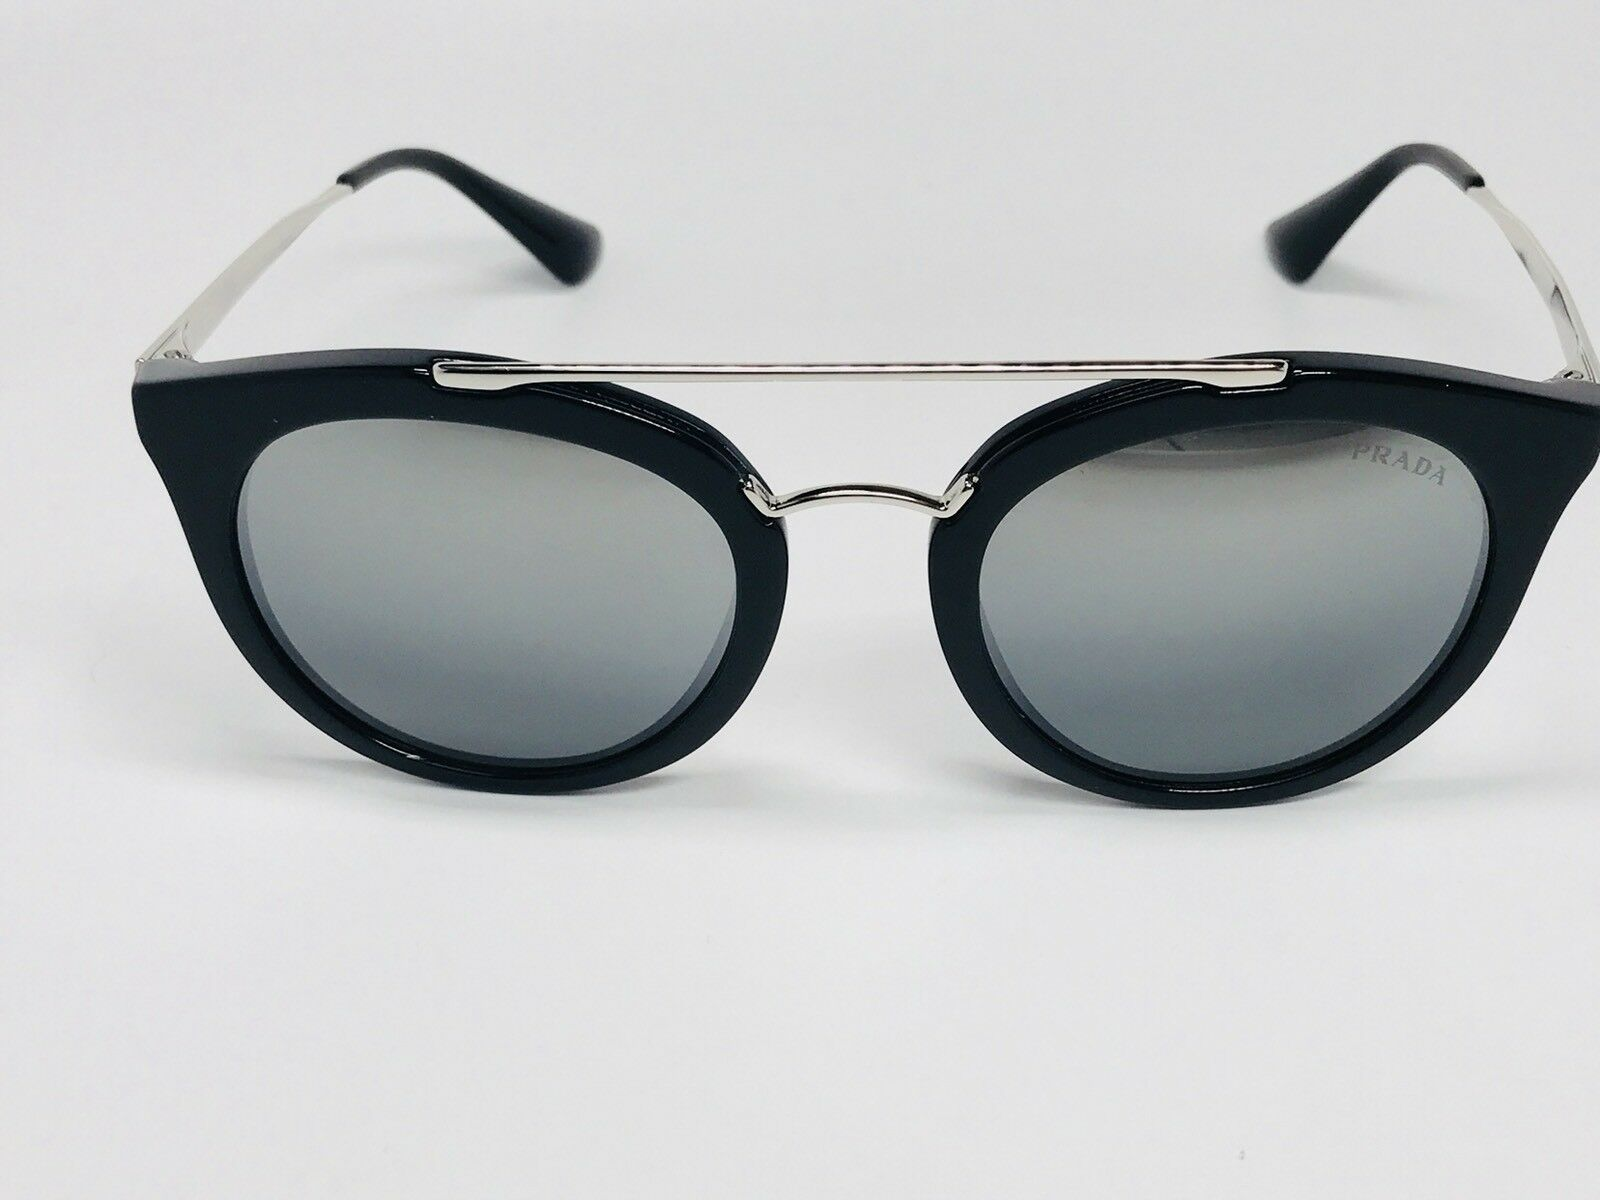 79d787d15e444  New PRADA SPR 23S 1AB-6N2 Black   Silver Sunglasses w Mirror Lens